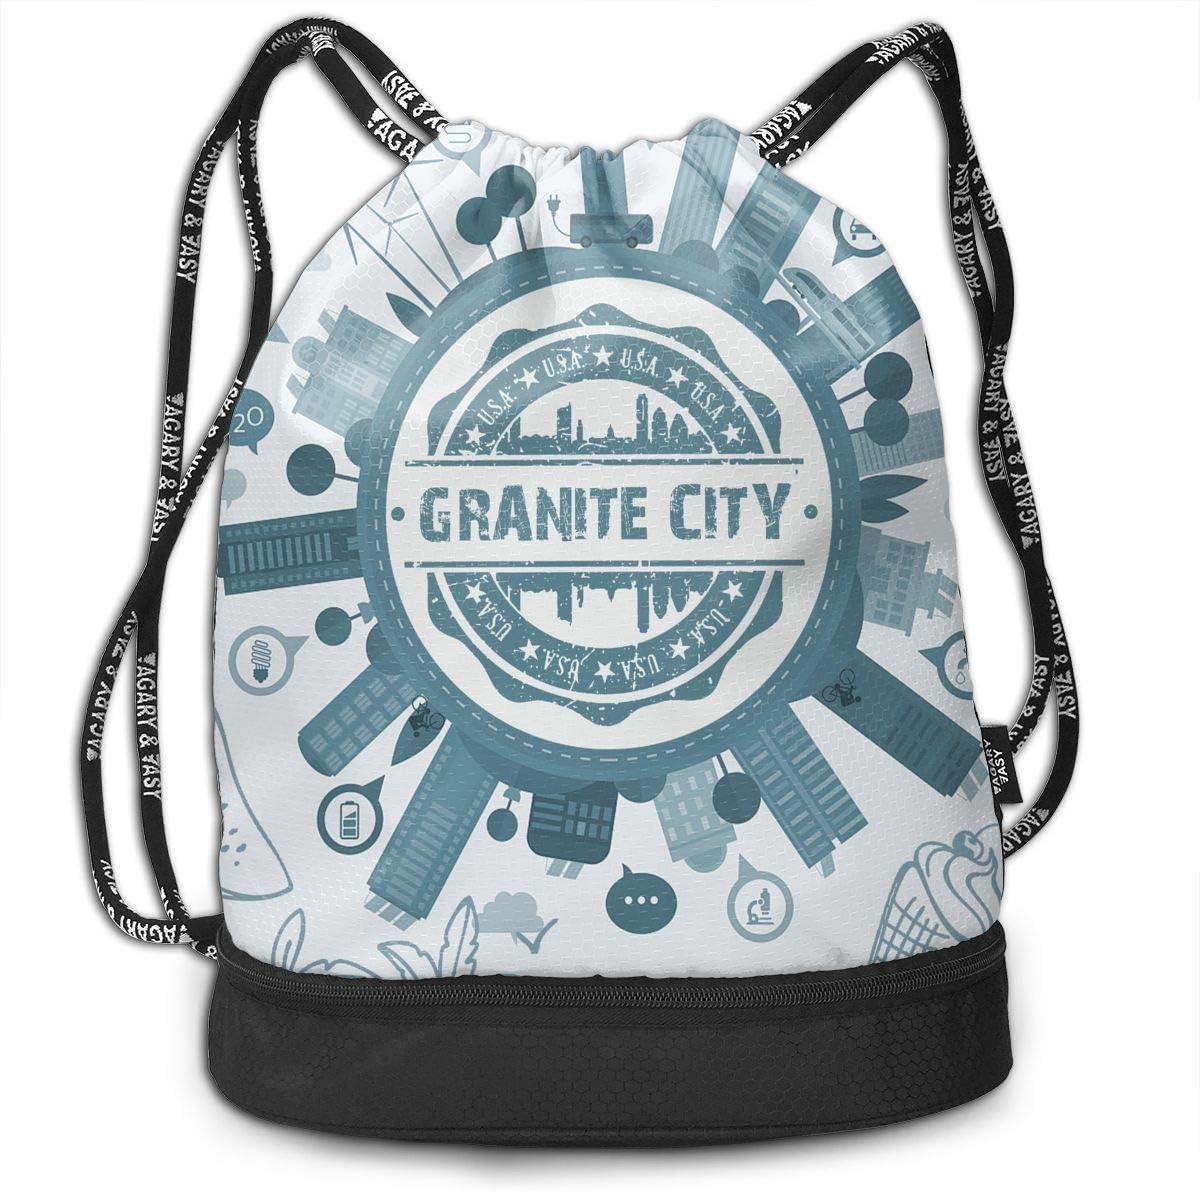 X-JUSEN Print Granite City Multi-Function Drawstring Bundle Backpack Tote Cinch Sack Gym Bag Pocket Daypack Burst Sackpack